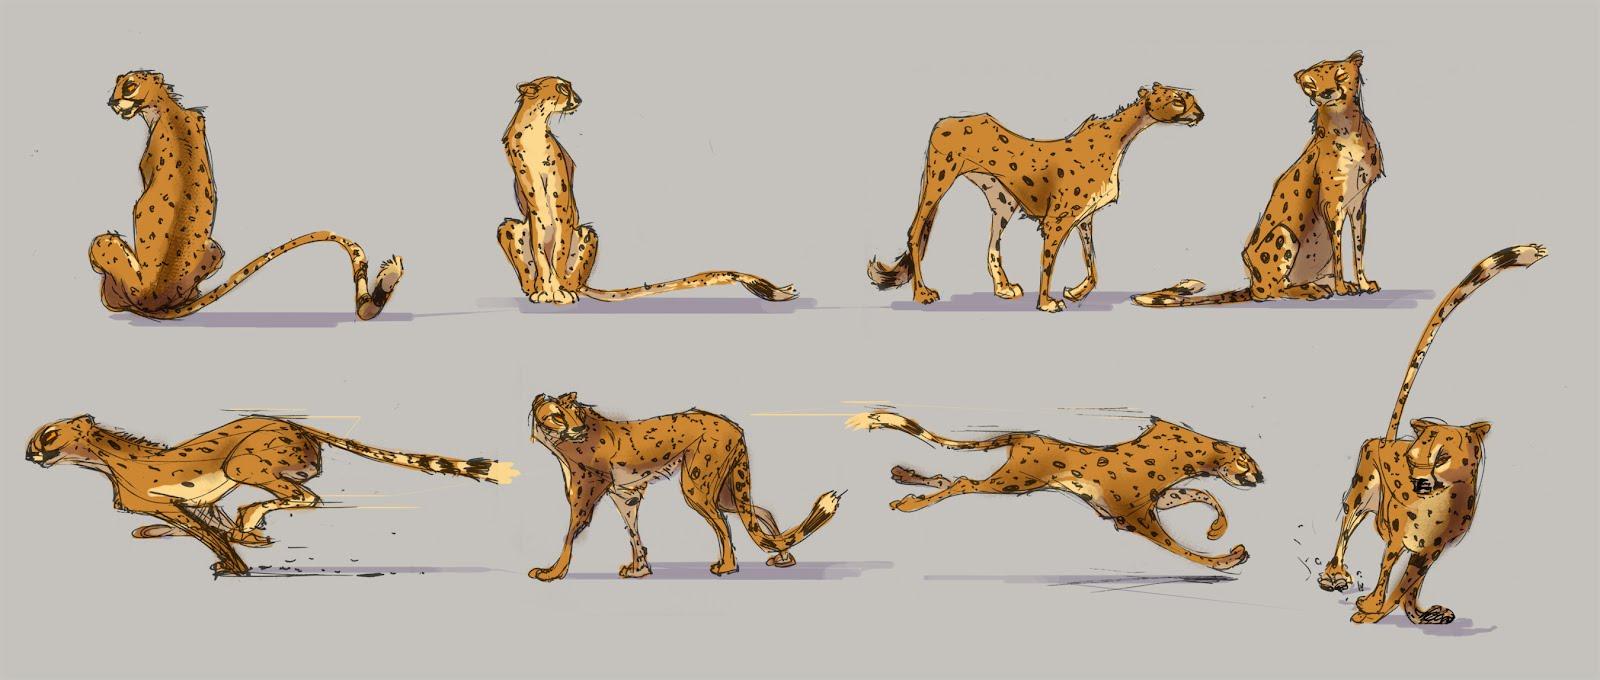 Aaron's Blah Blah Blog: Cheetah designs